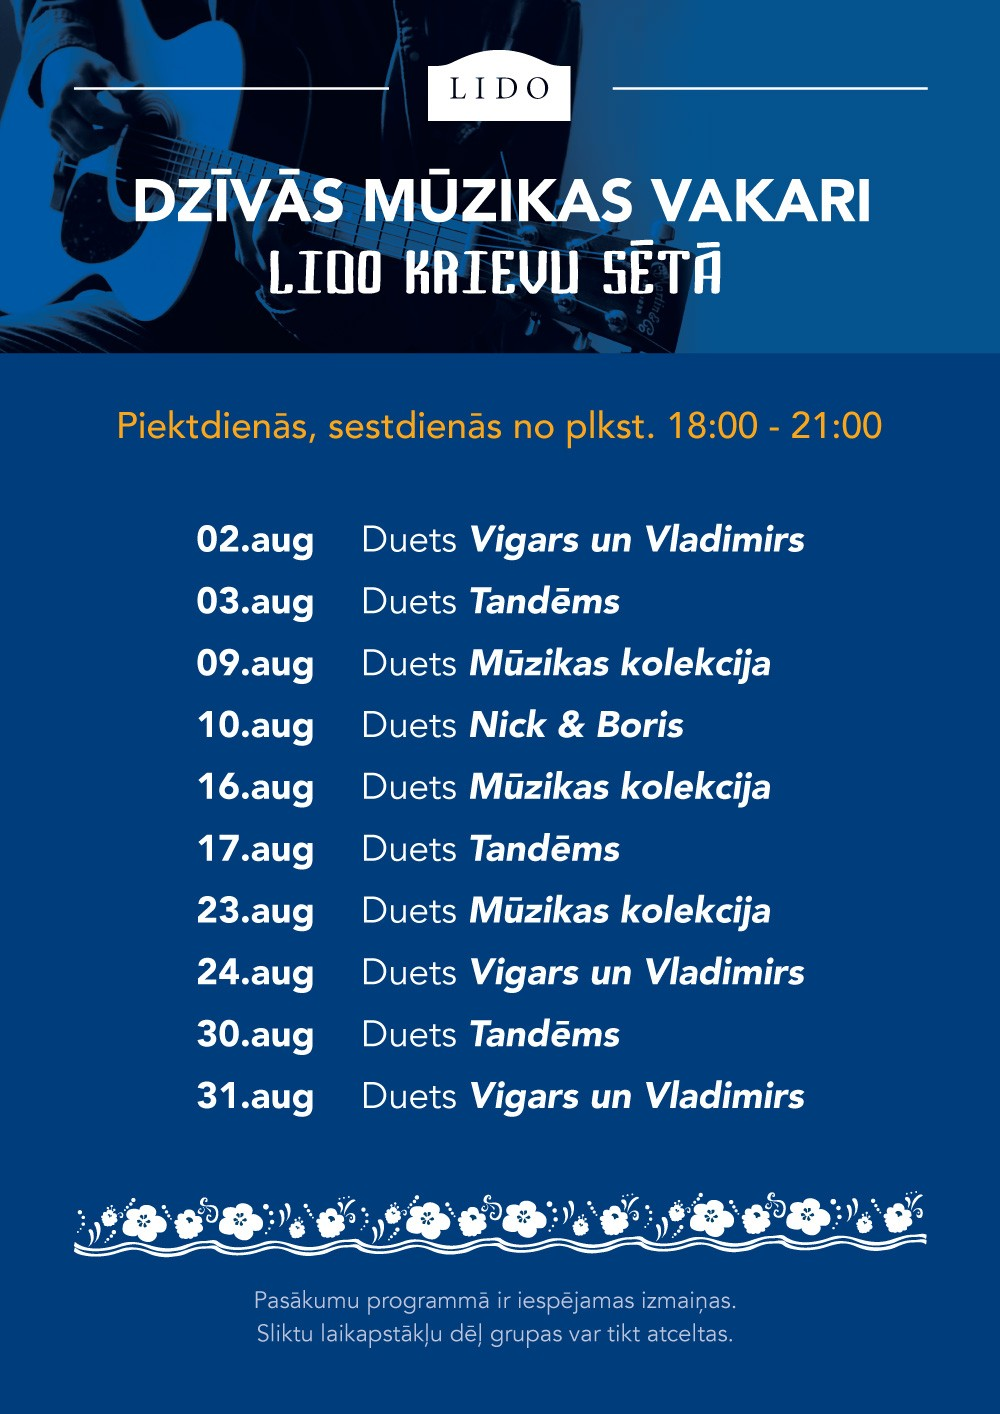 KrievuSeta-Augusts-A4-07.2019.jpg